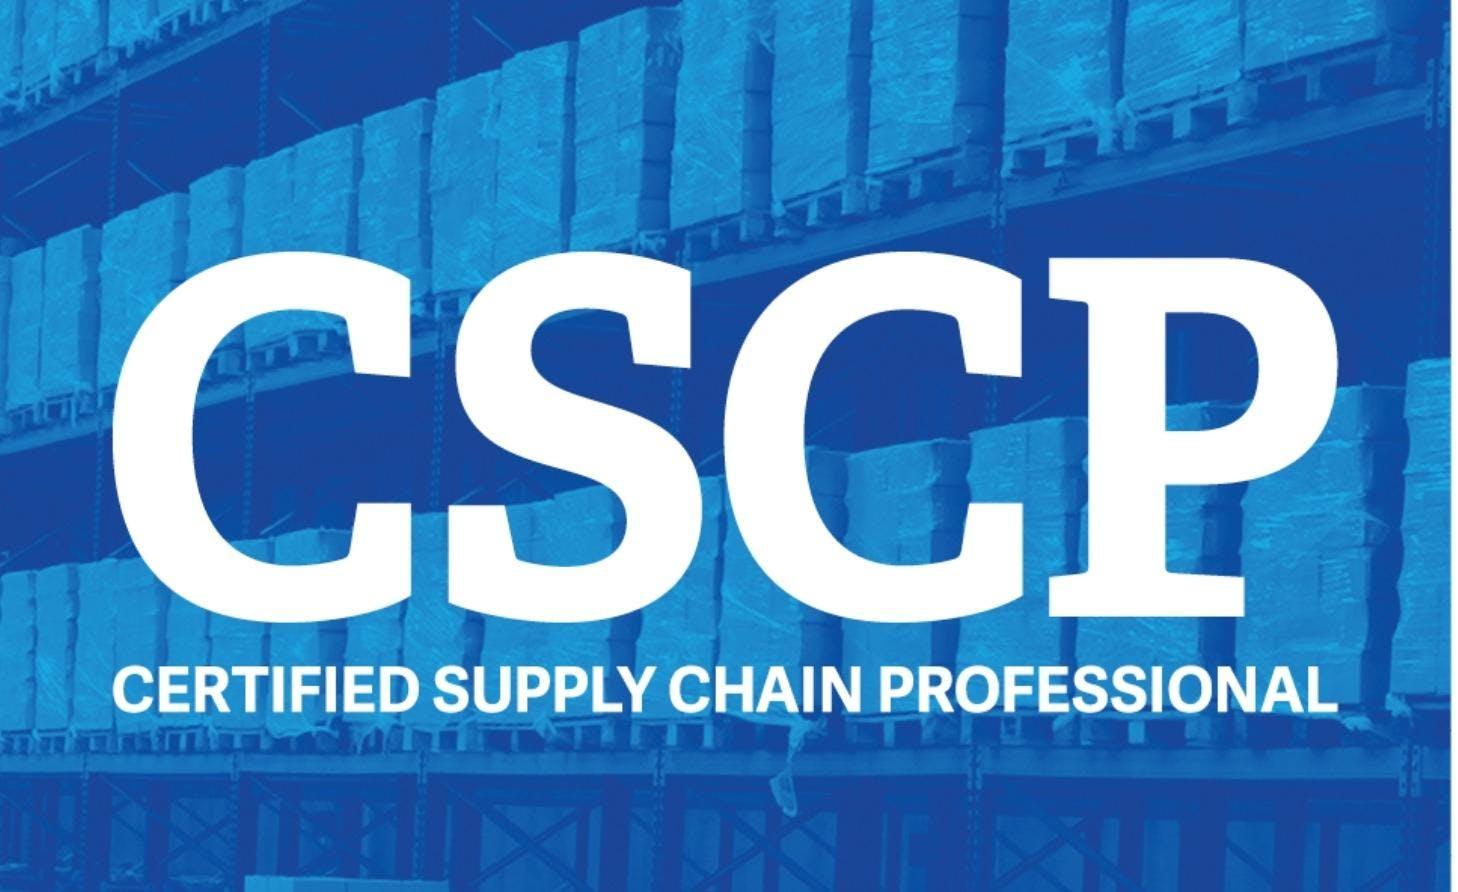 Cscp Certified Supply Chain Professional Training Dubai 9 Nov 2018